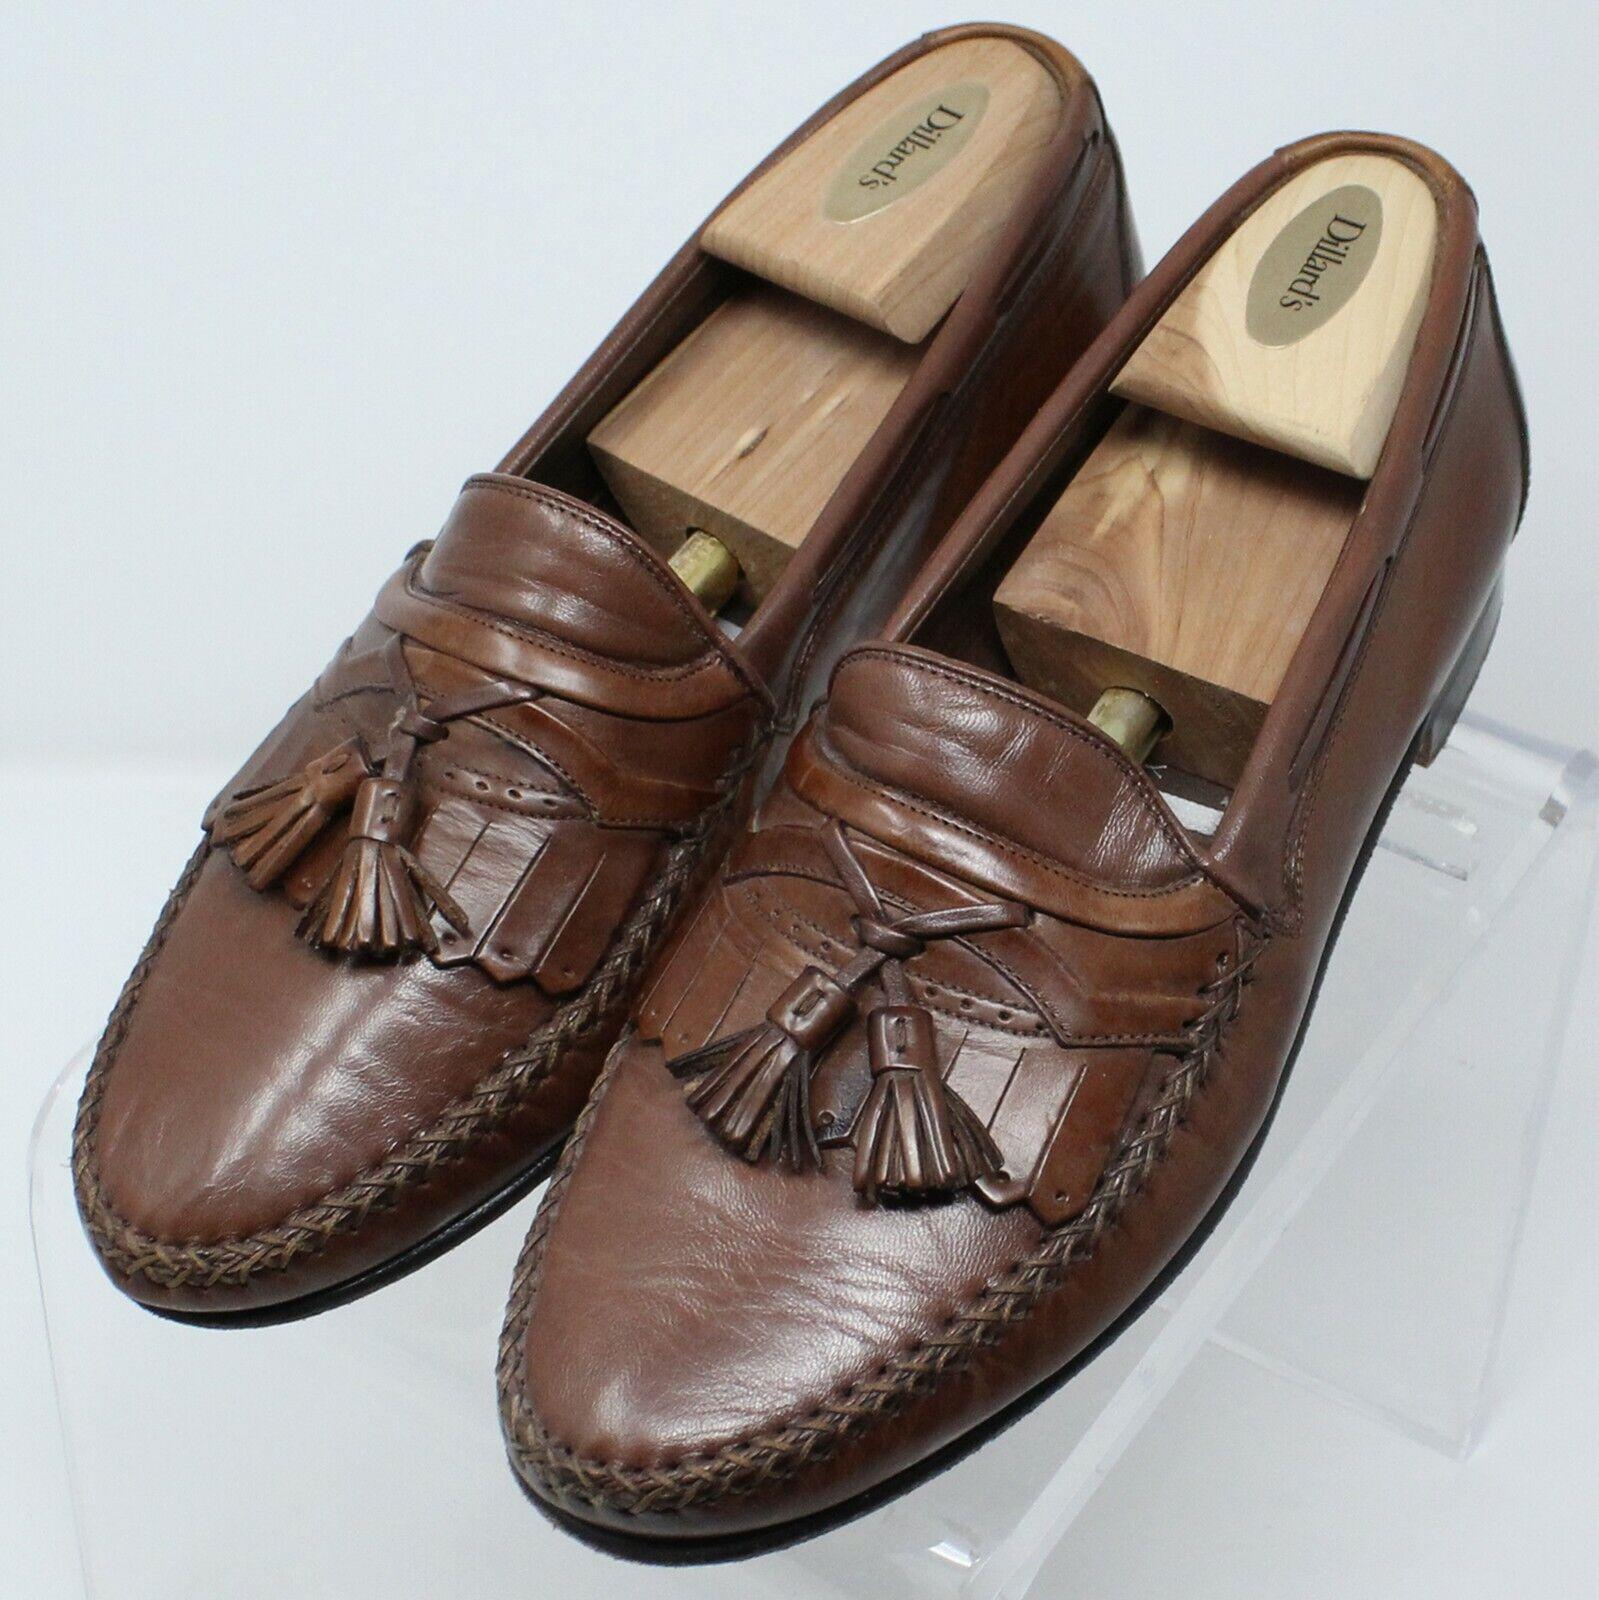 Johnston & Murphy Handcrafted braun Tassel Loafer Men Sz 9.5 D M  8134 EUC